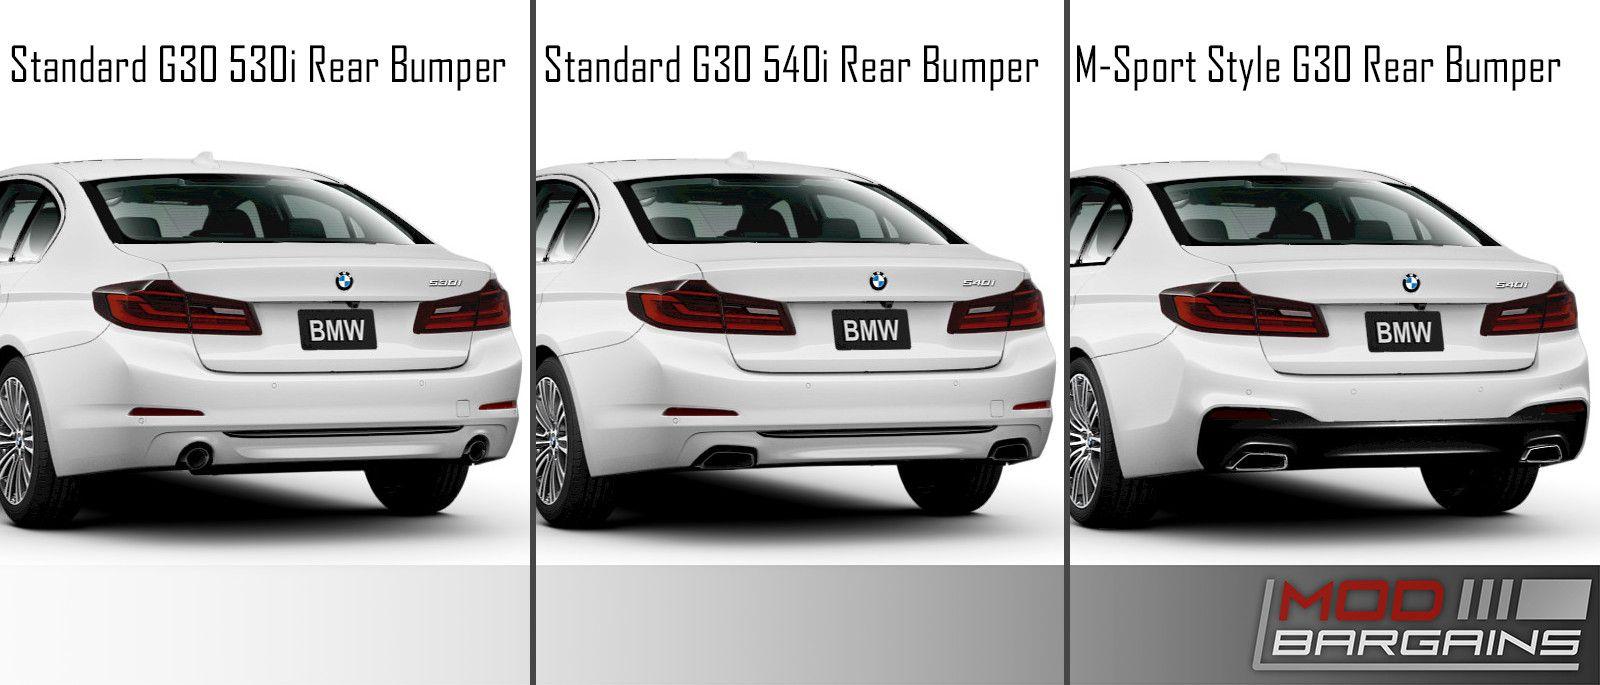 BMW G30 5 series Standard Rear Bumper vs MSport Style Rear Bumper G30MTRR-540